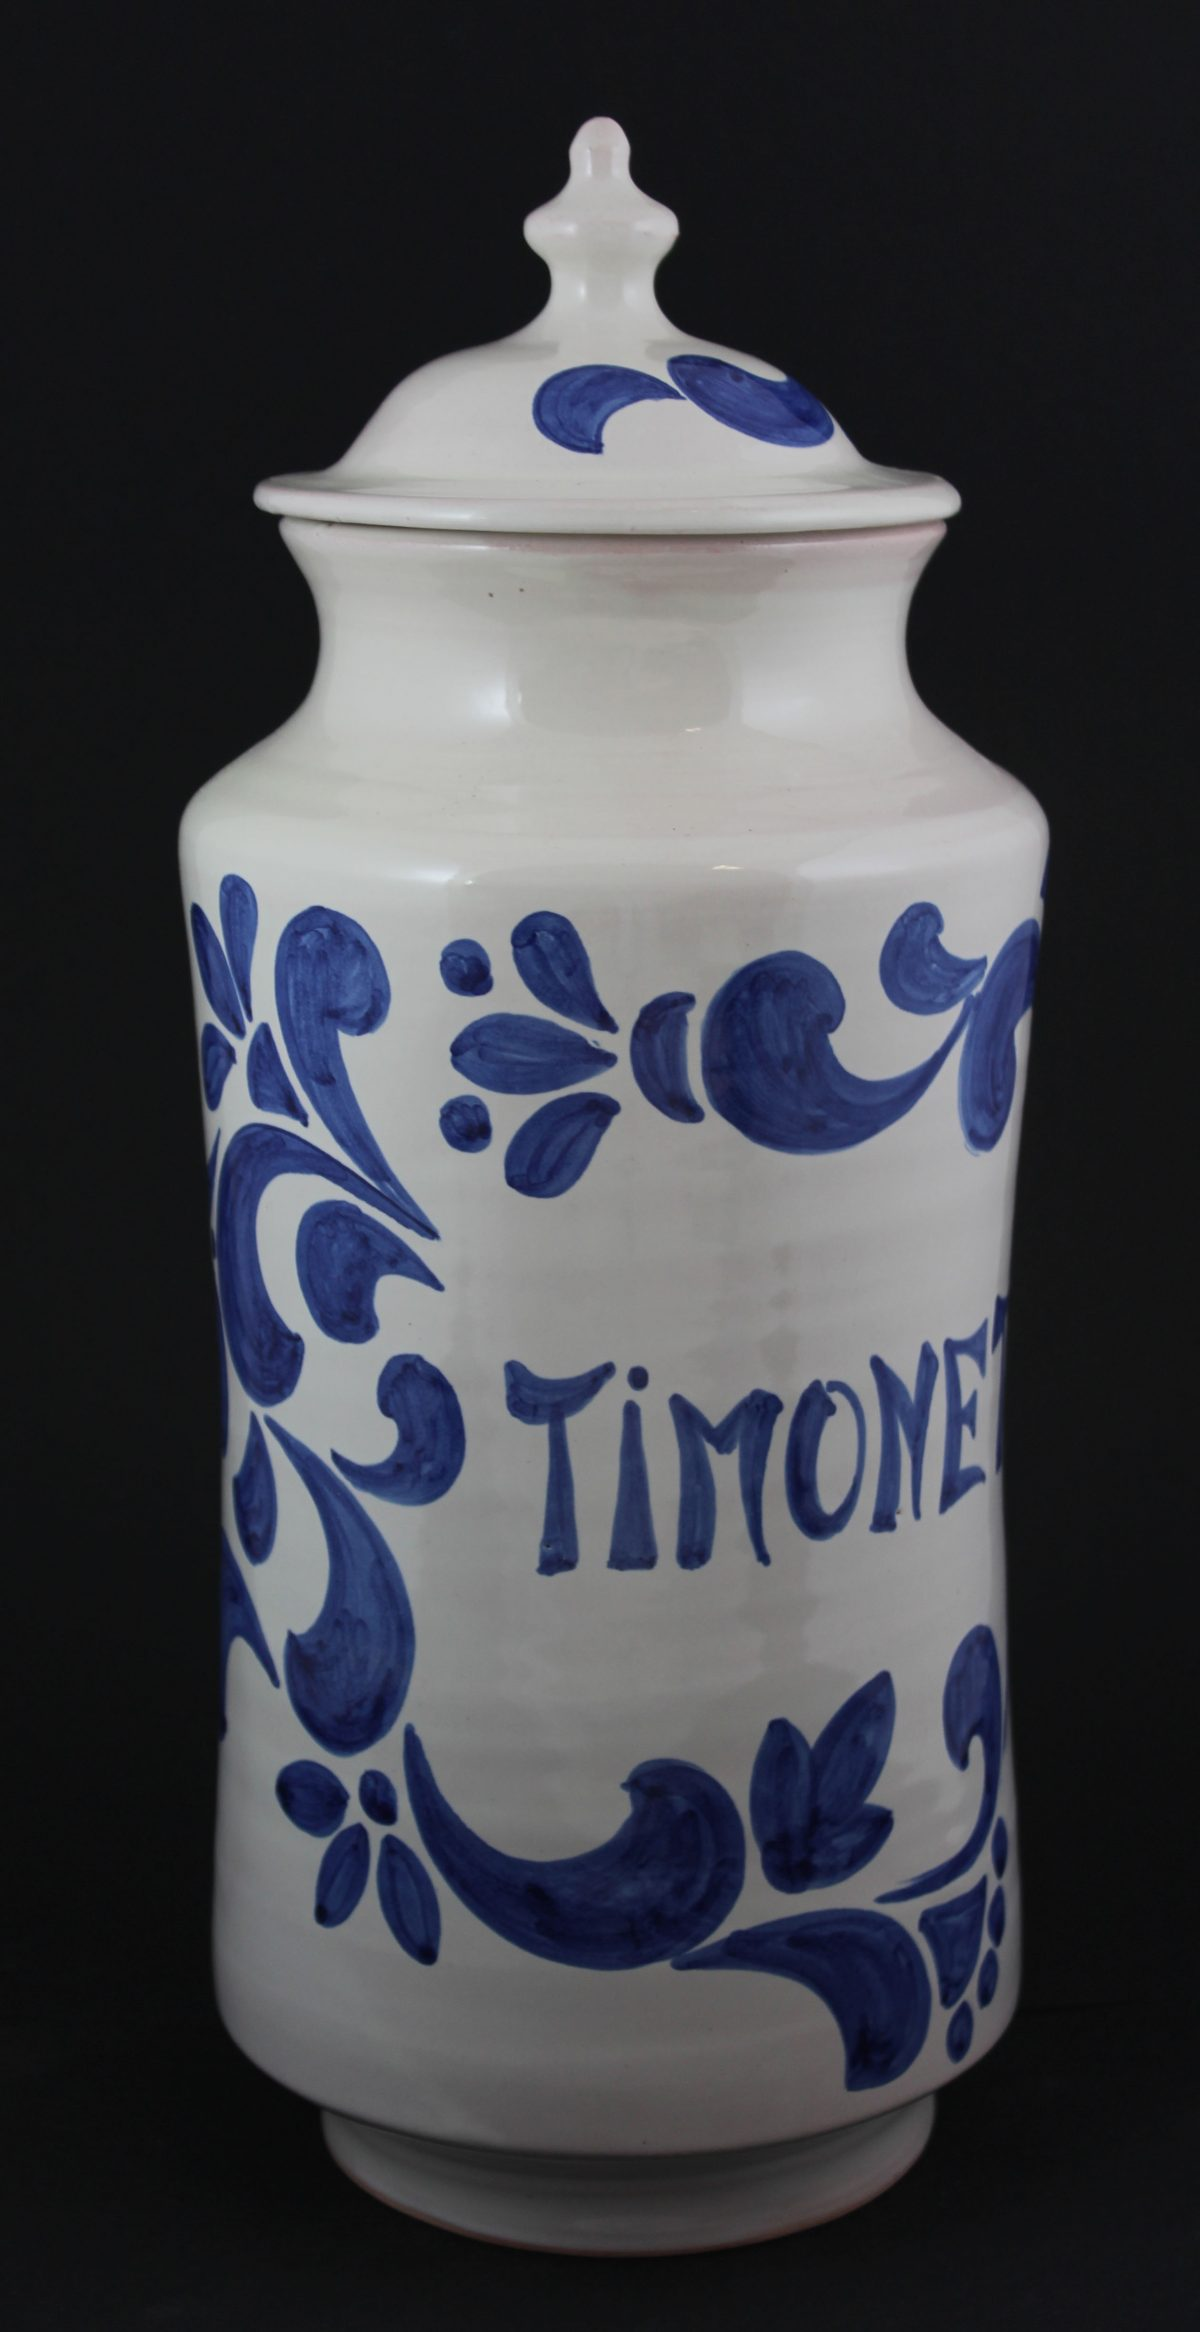 Pot farmàcia timonet - Pepe Royo Alcaraz